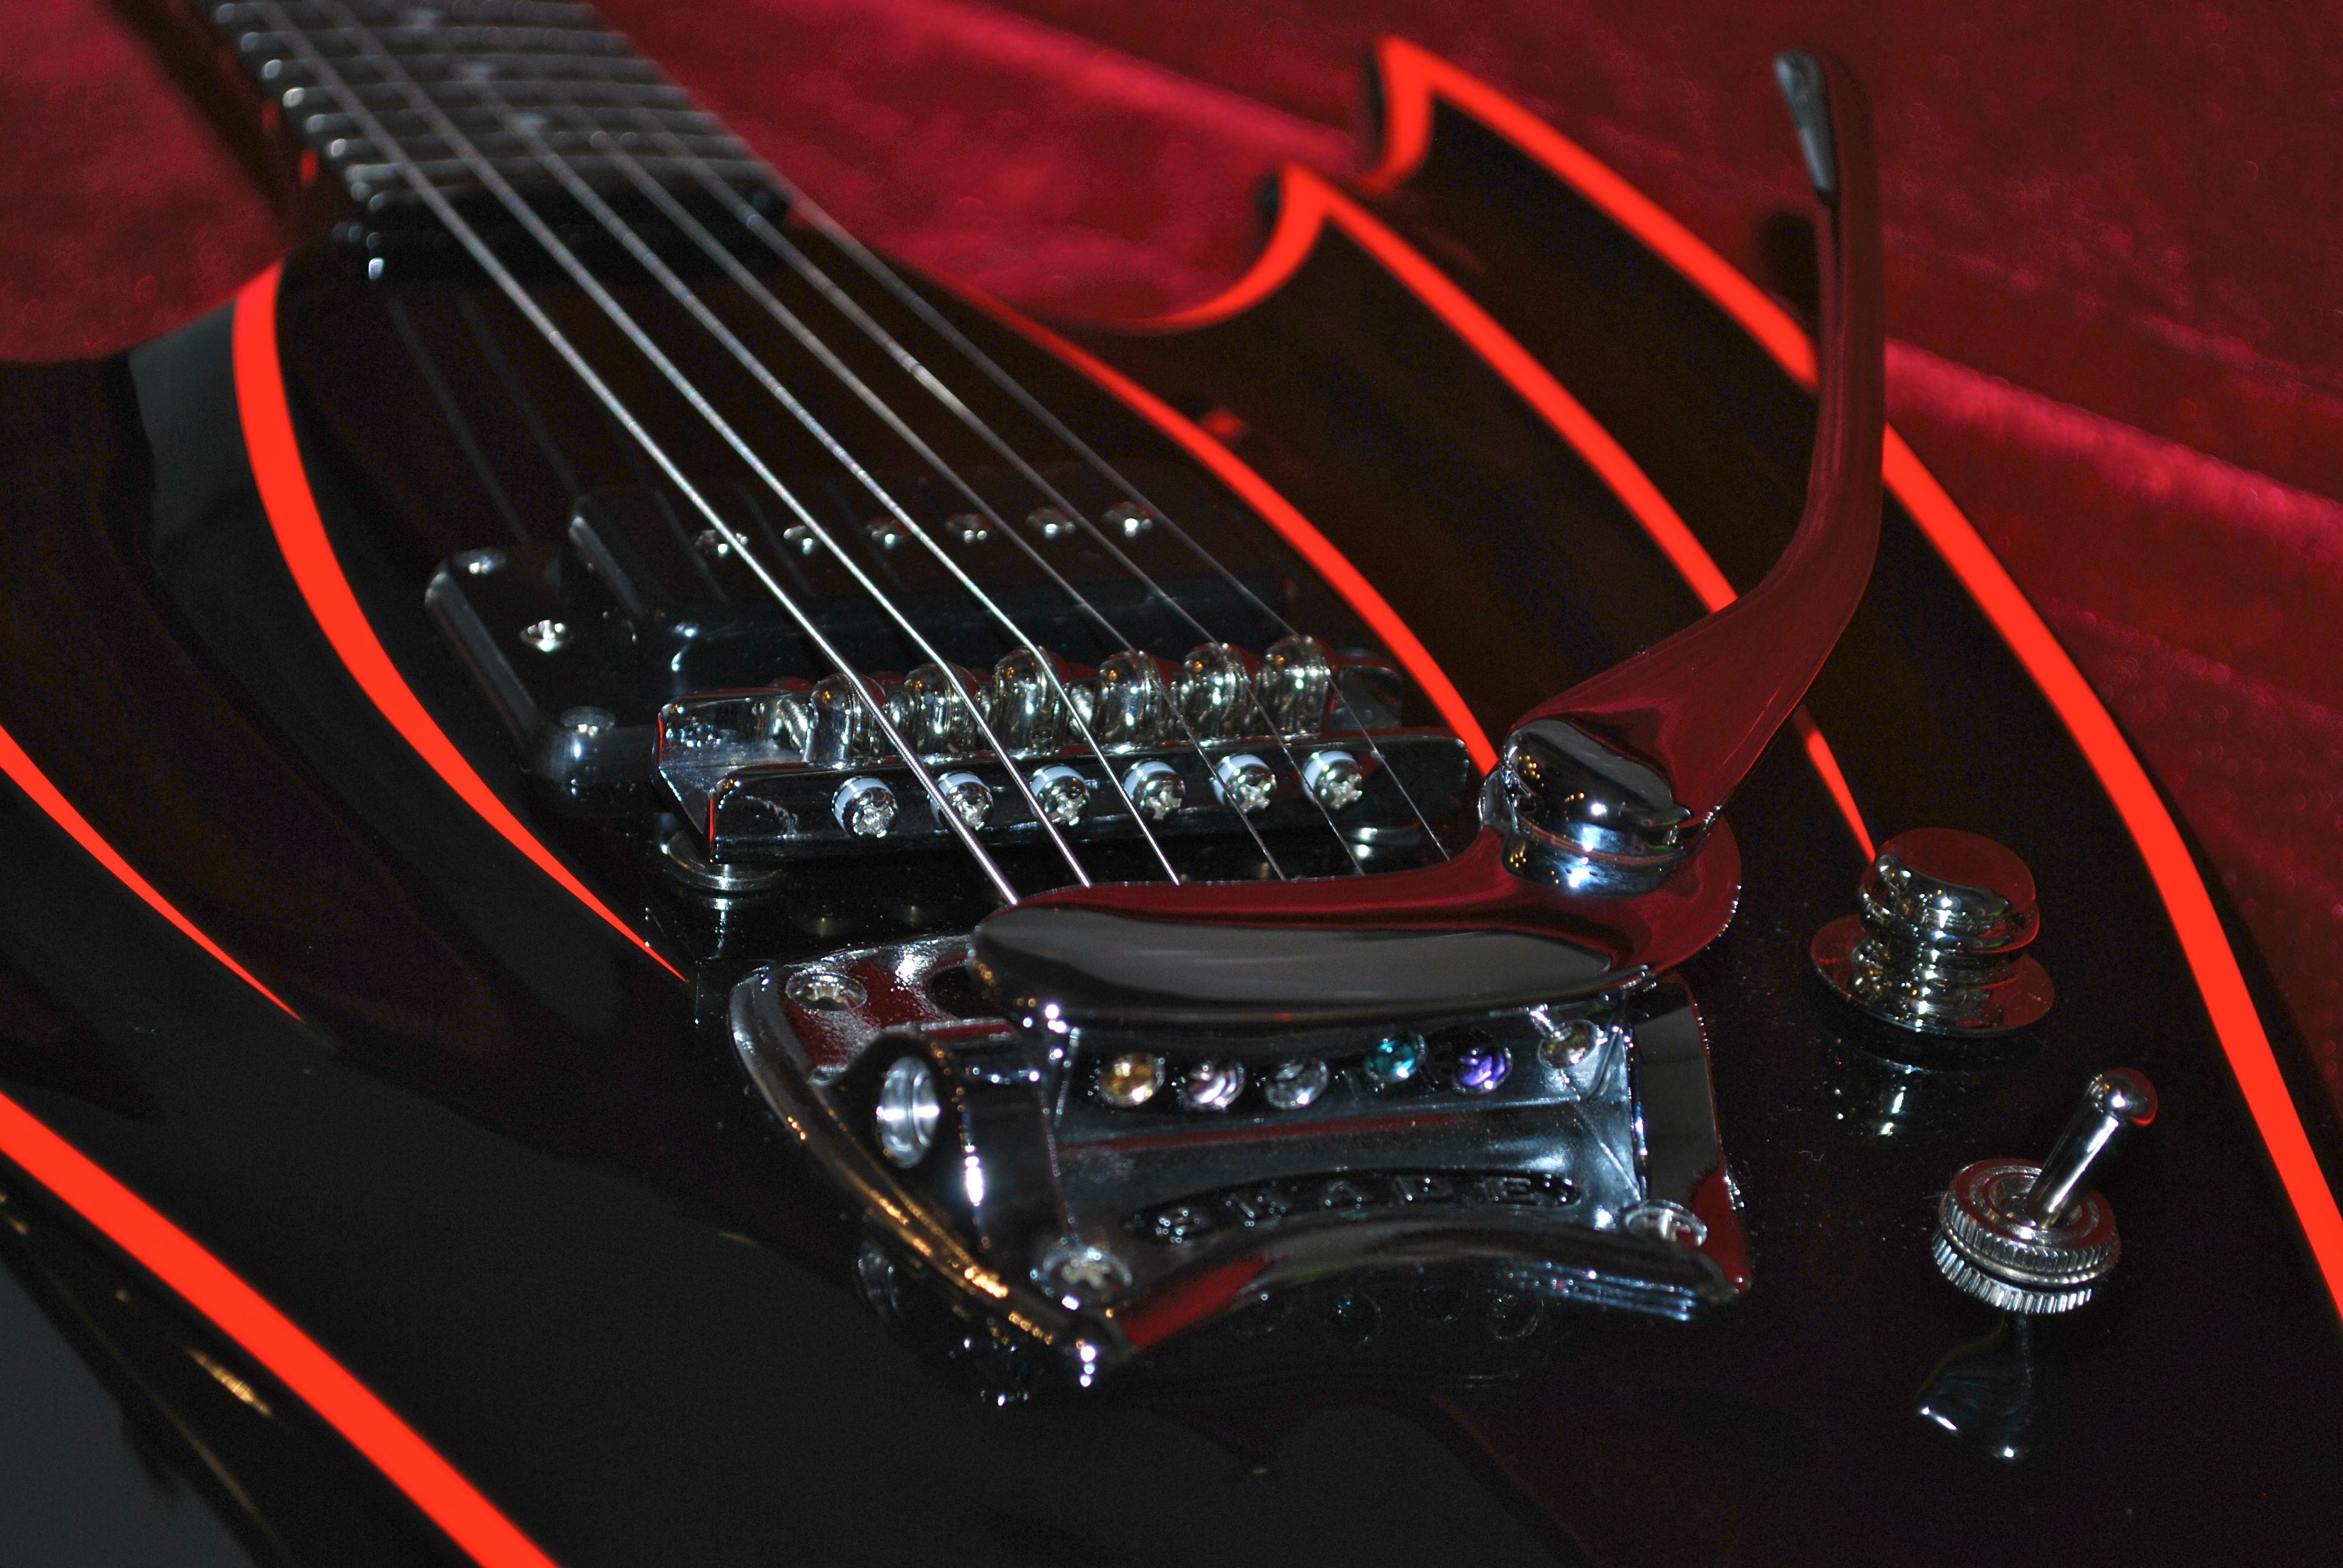 Wing-Bat by Hallmark Guitars